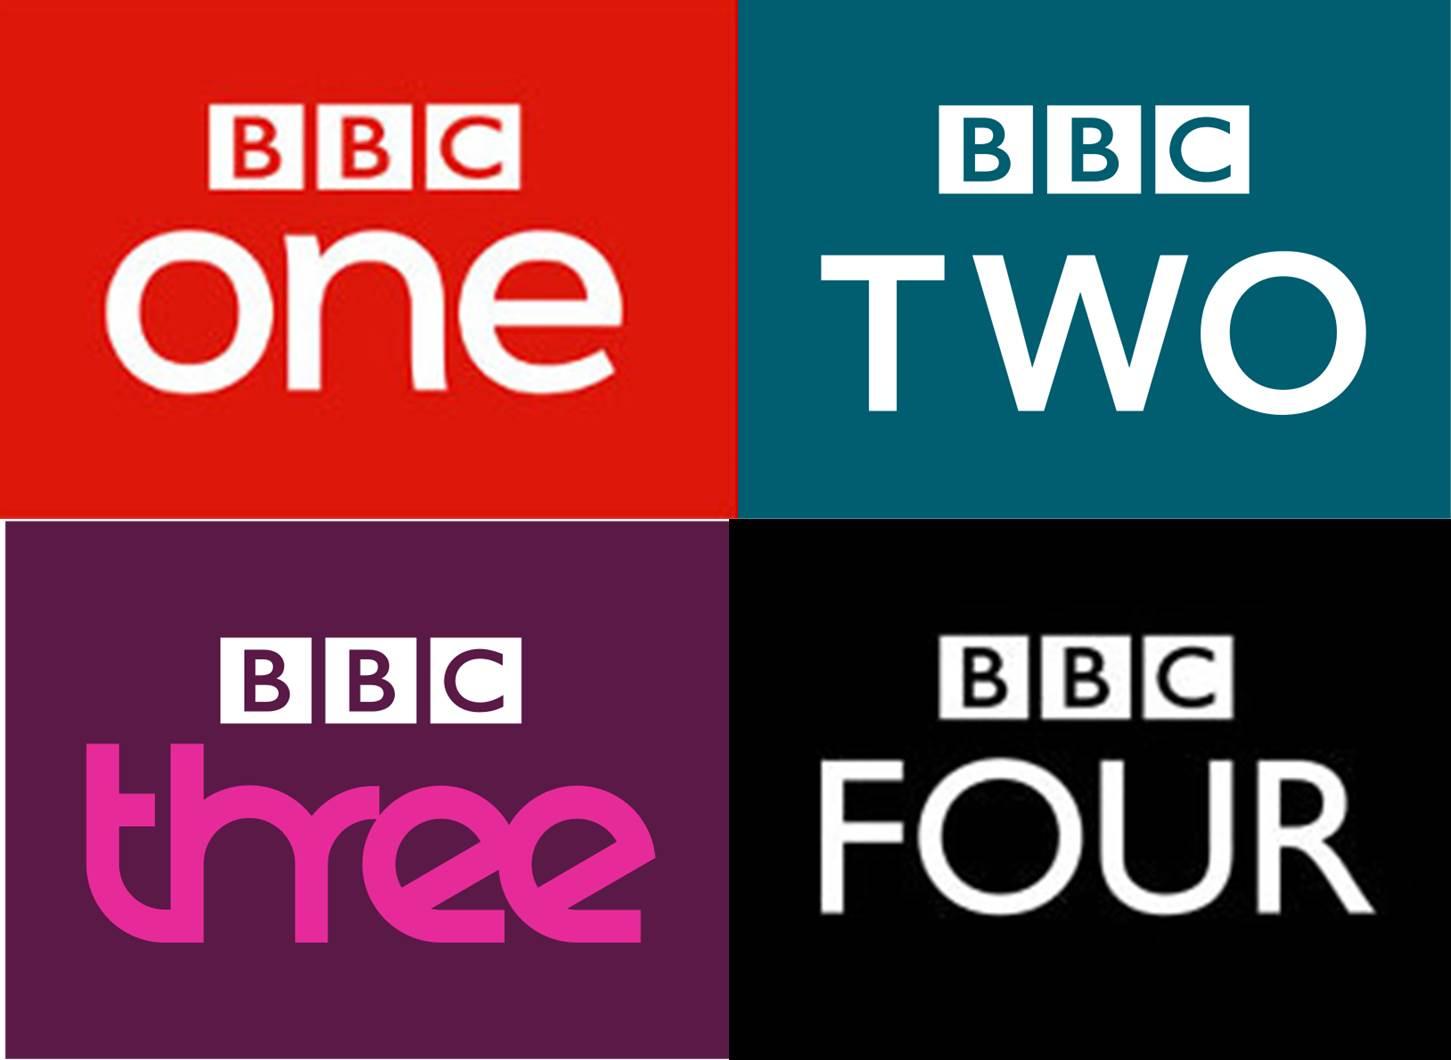 bbc - photo #33